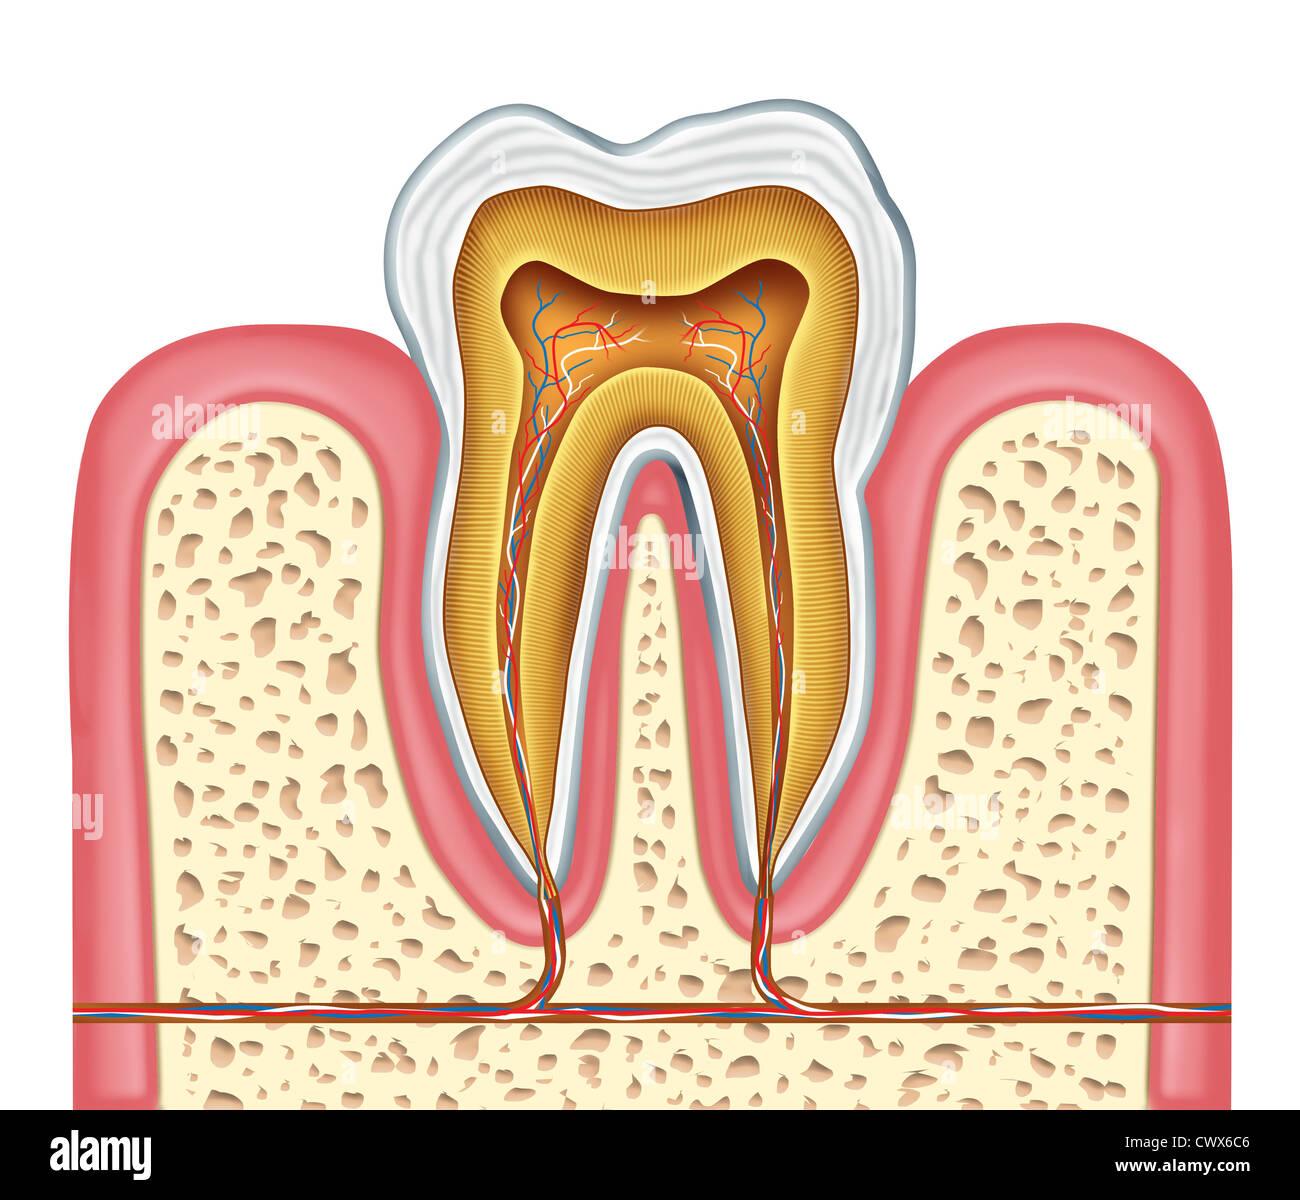 Dentin Imágenes De Stock & Dentin Fotos De Stock - Página 3 - Alamy